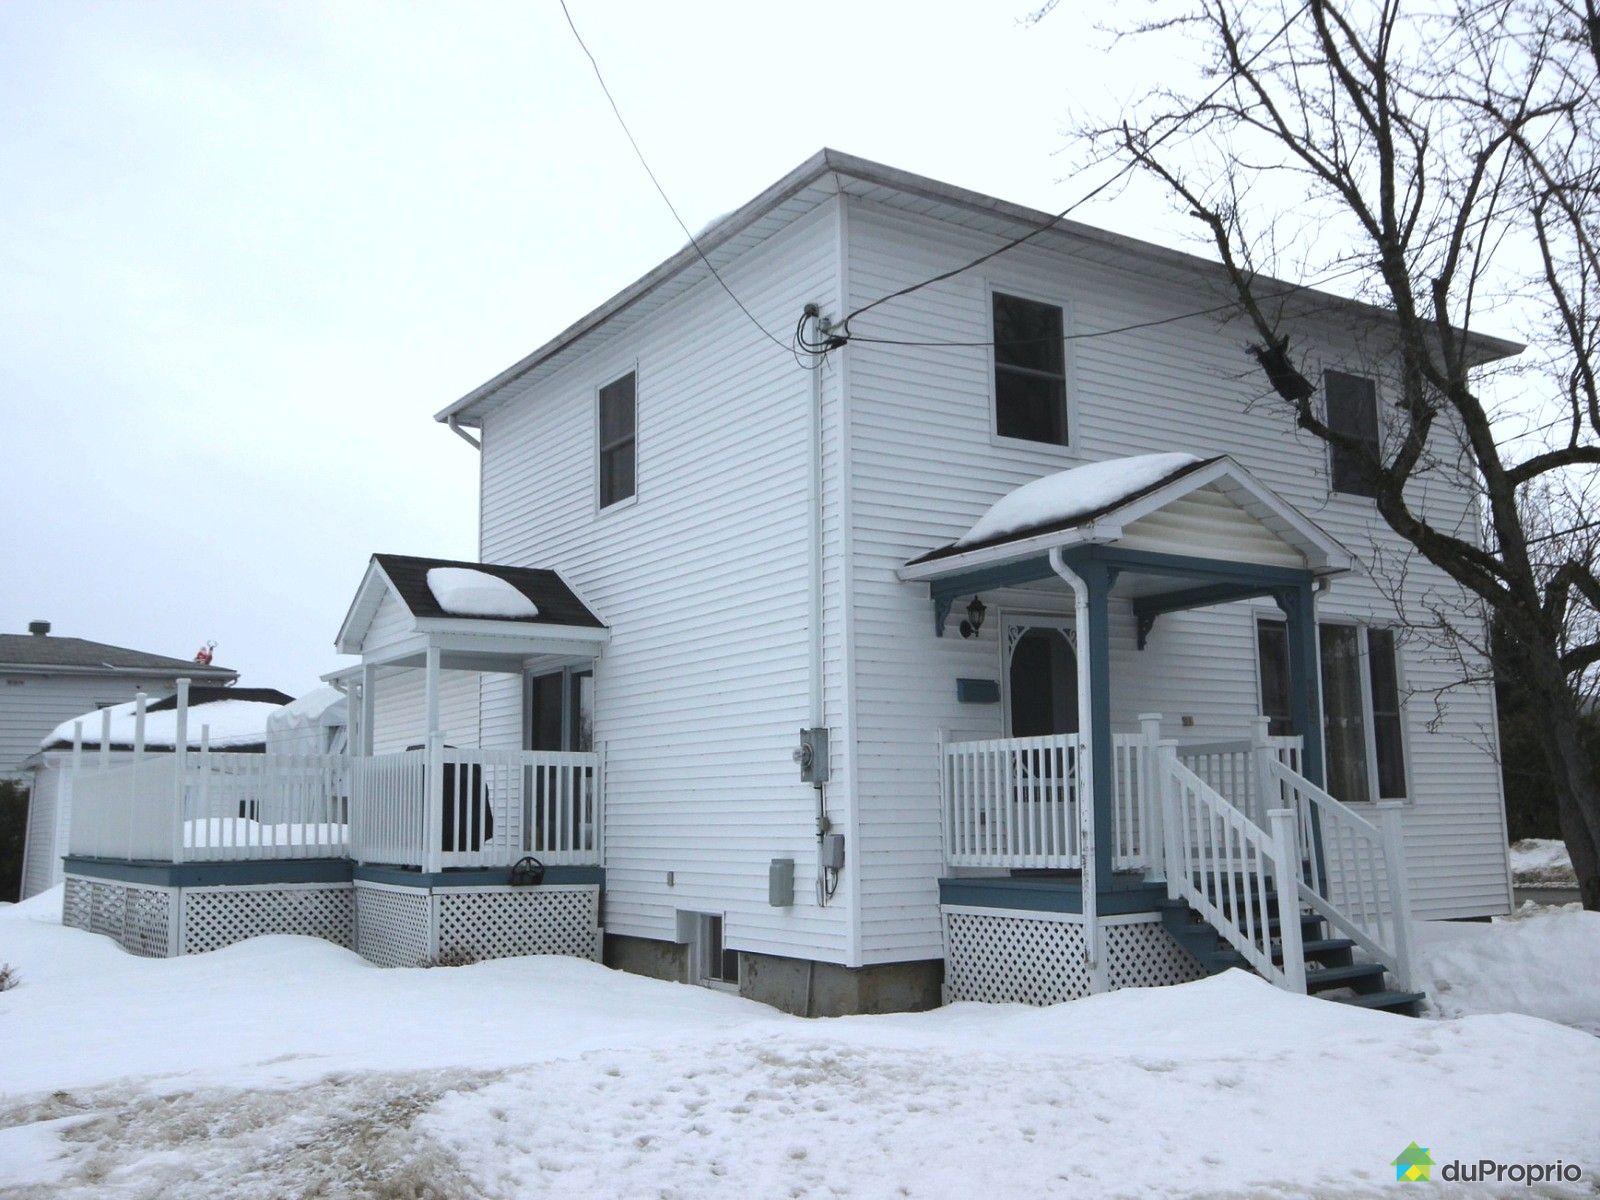 maison vendre east angus 285 rue york immobilier qu bec duproprio 596281. Black Bedroom Furniture Sets. Home Design Ideas